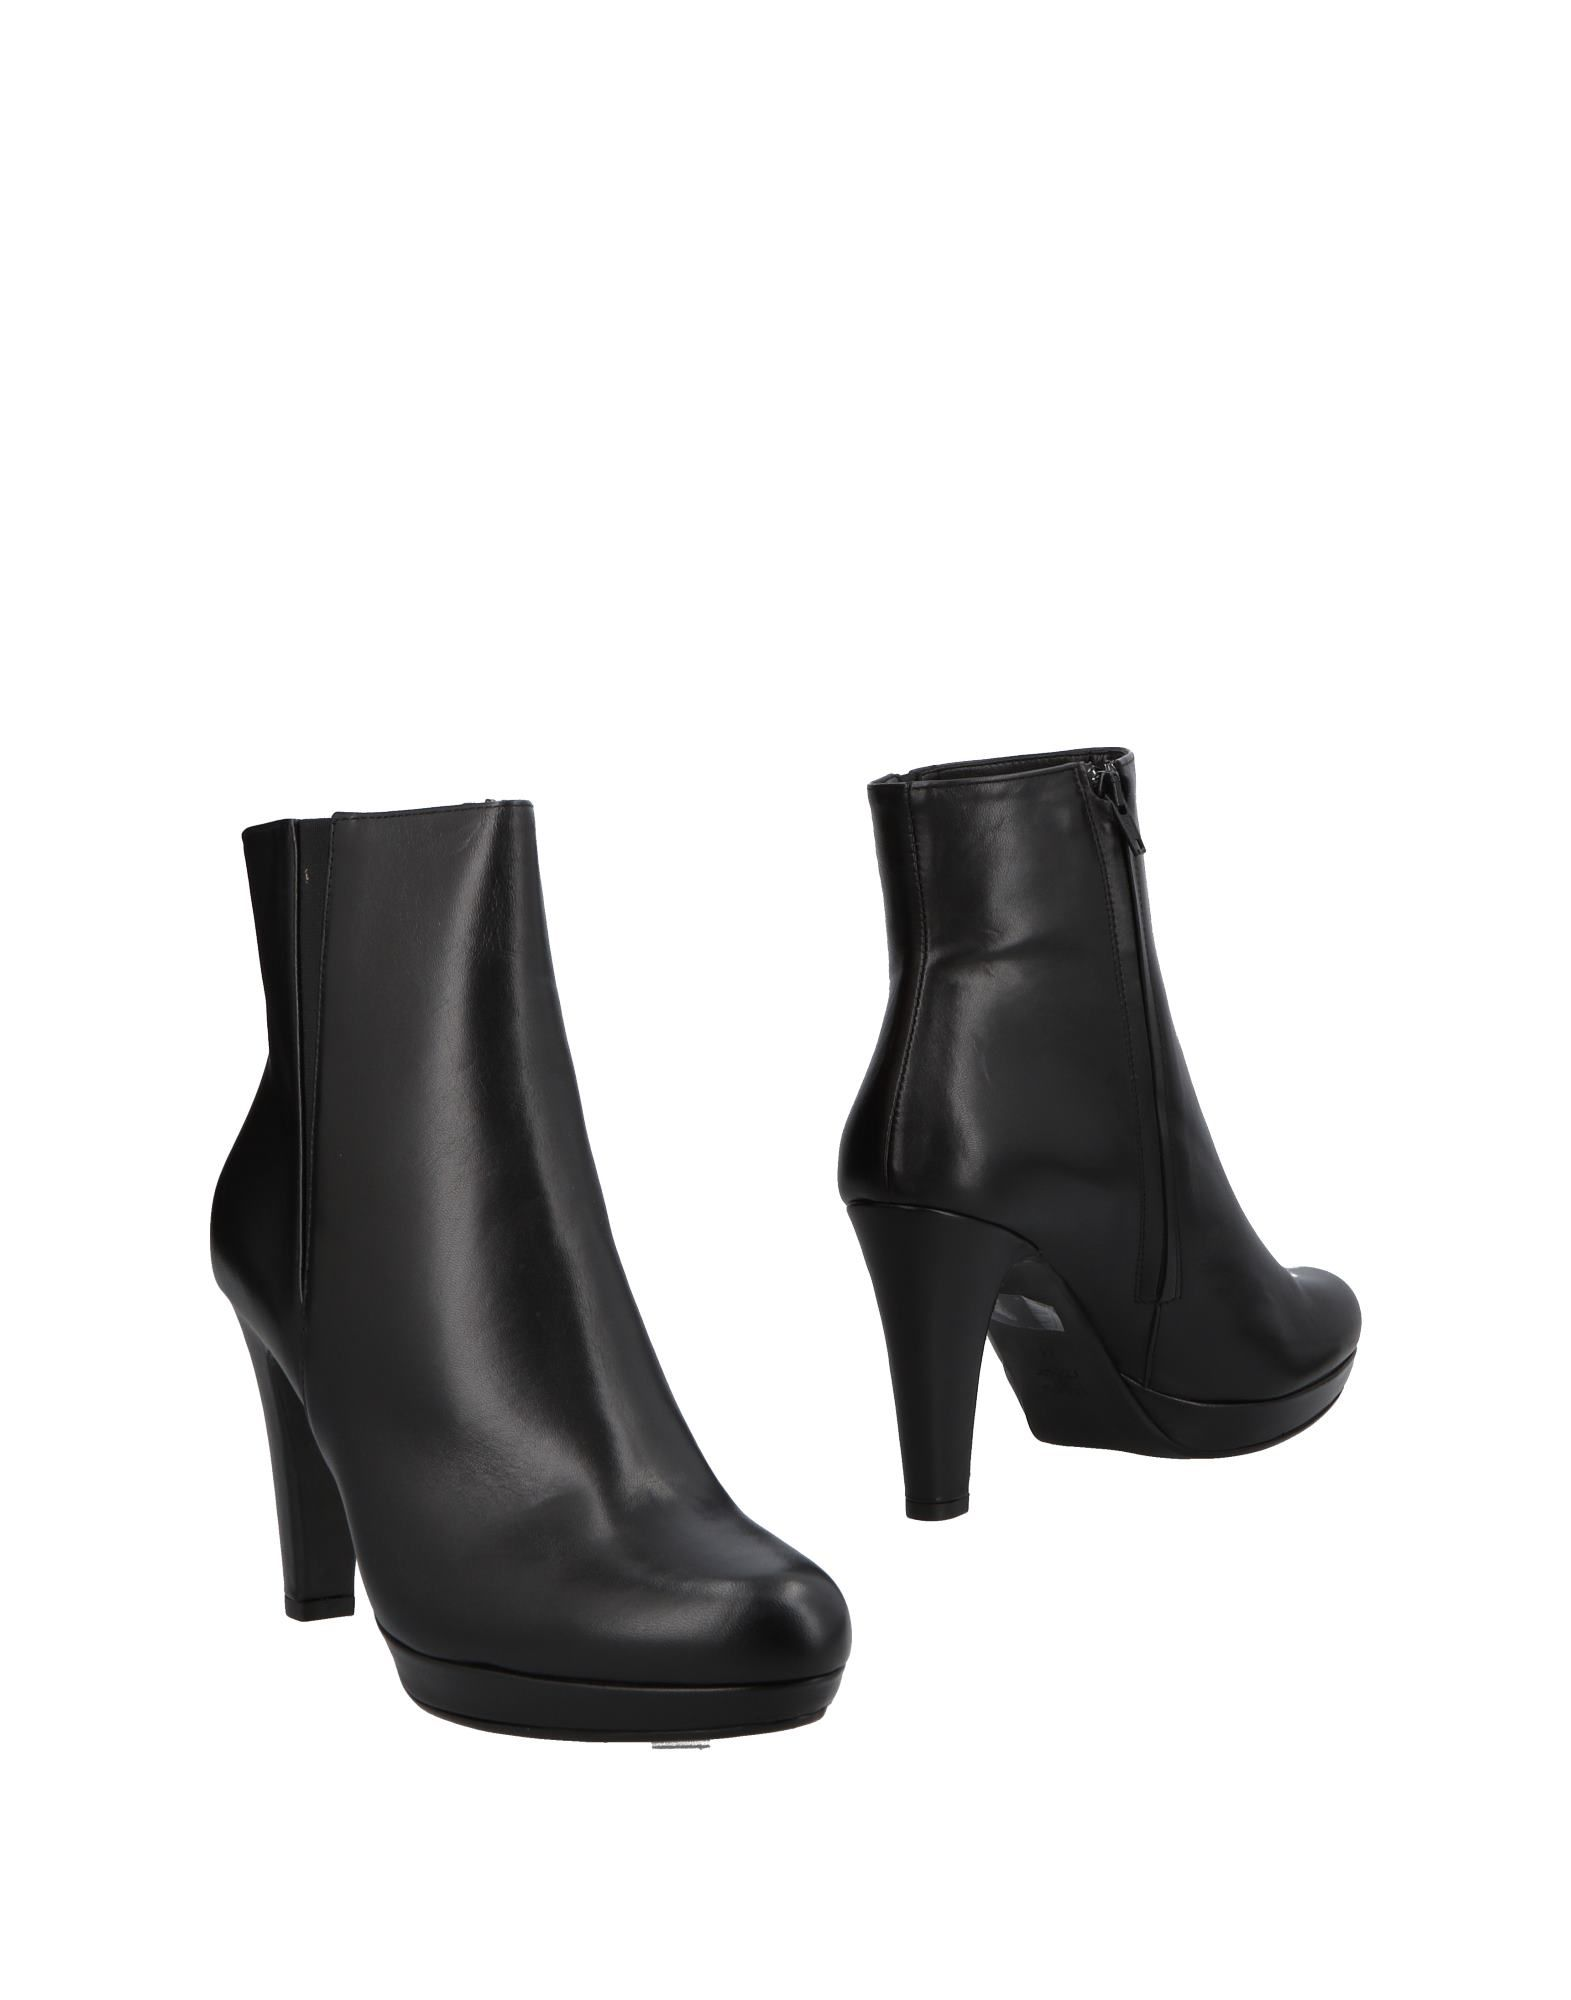 L'amour Stiefelette Schuhe Damen  11492414ID Heiße Schuhe Stiefelette 4e81f5